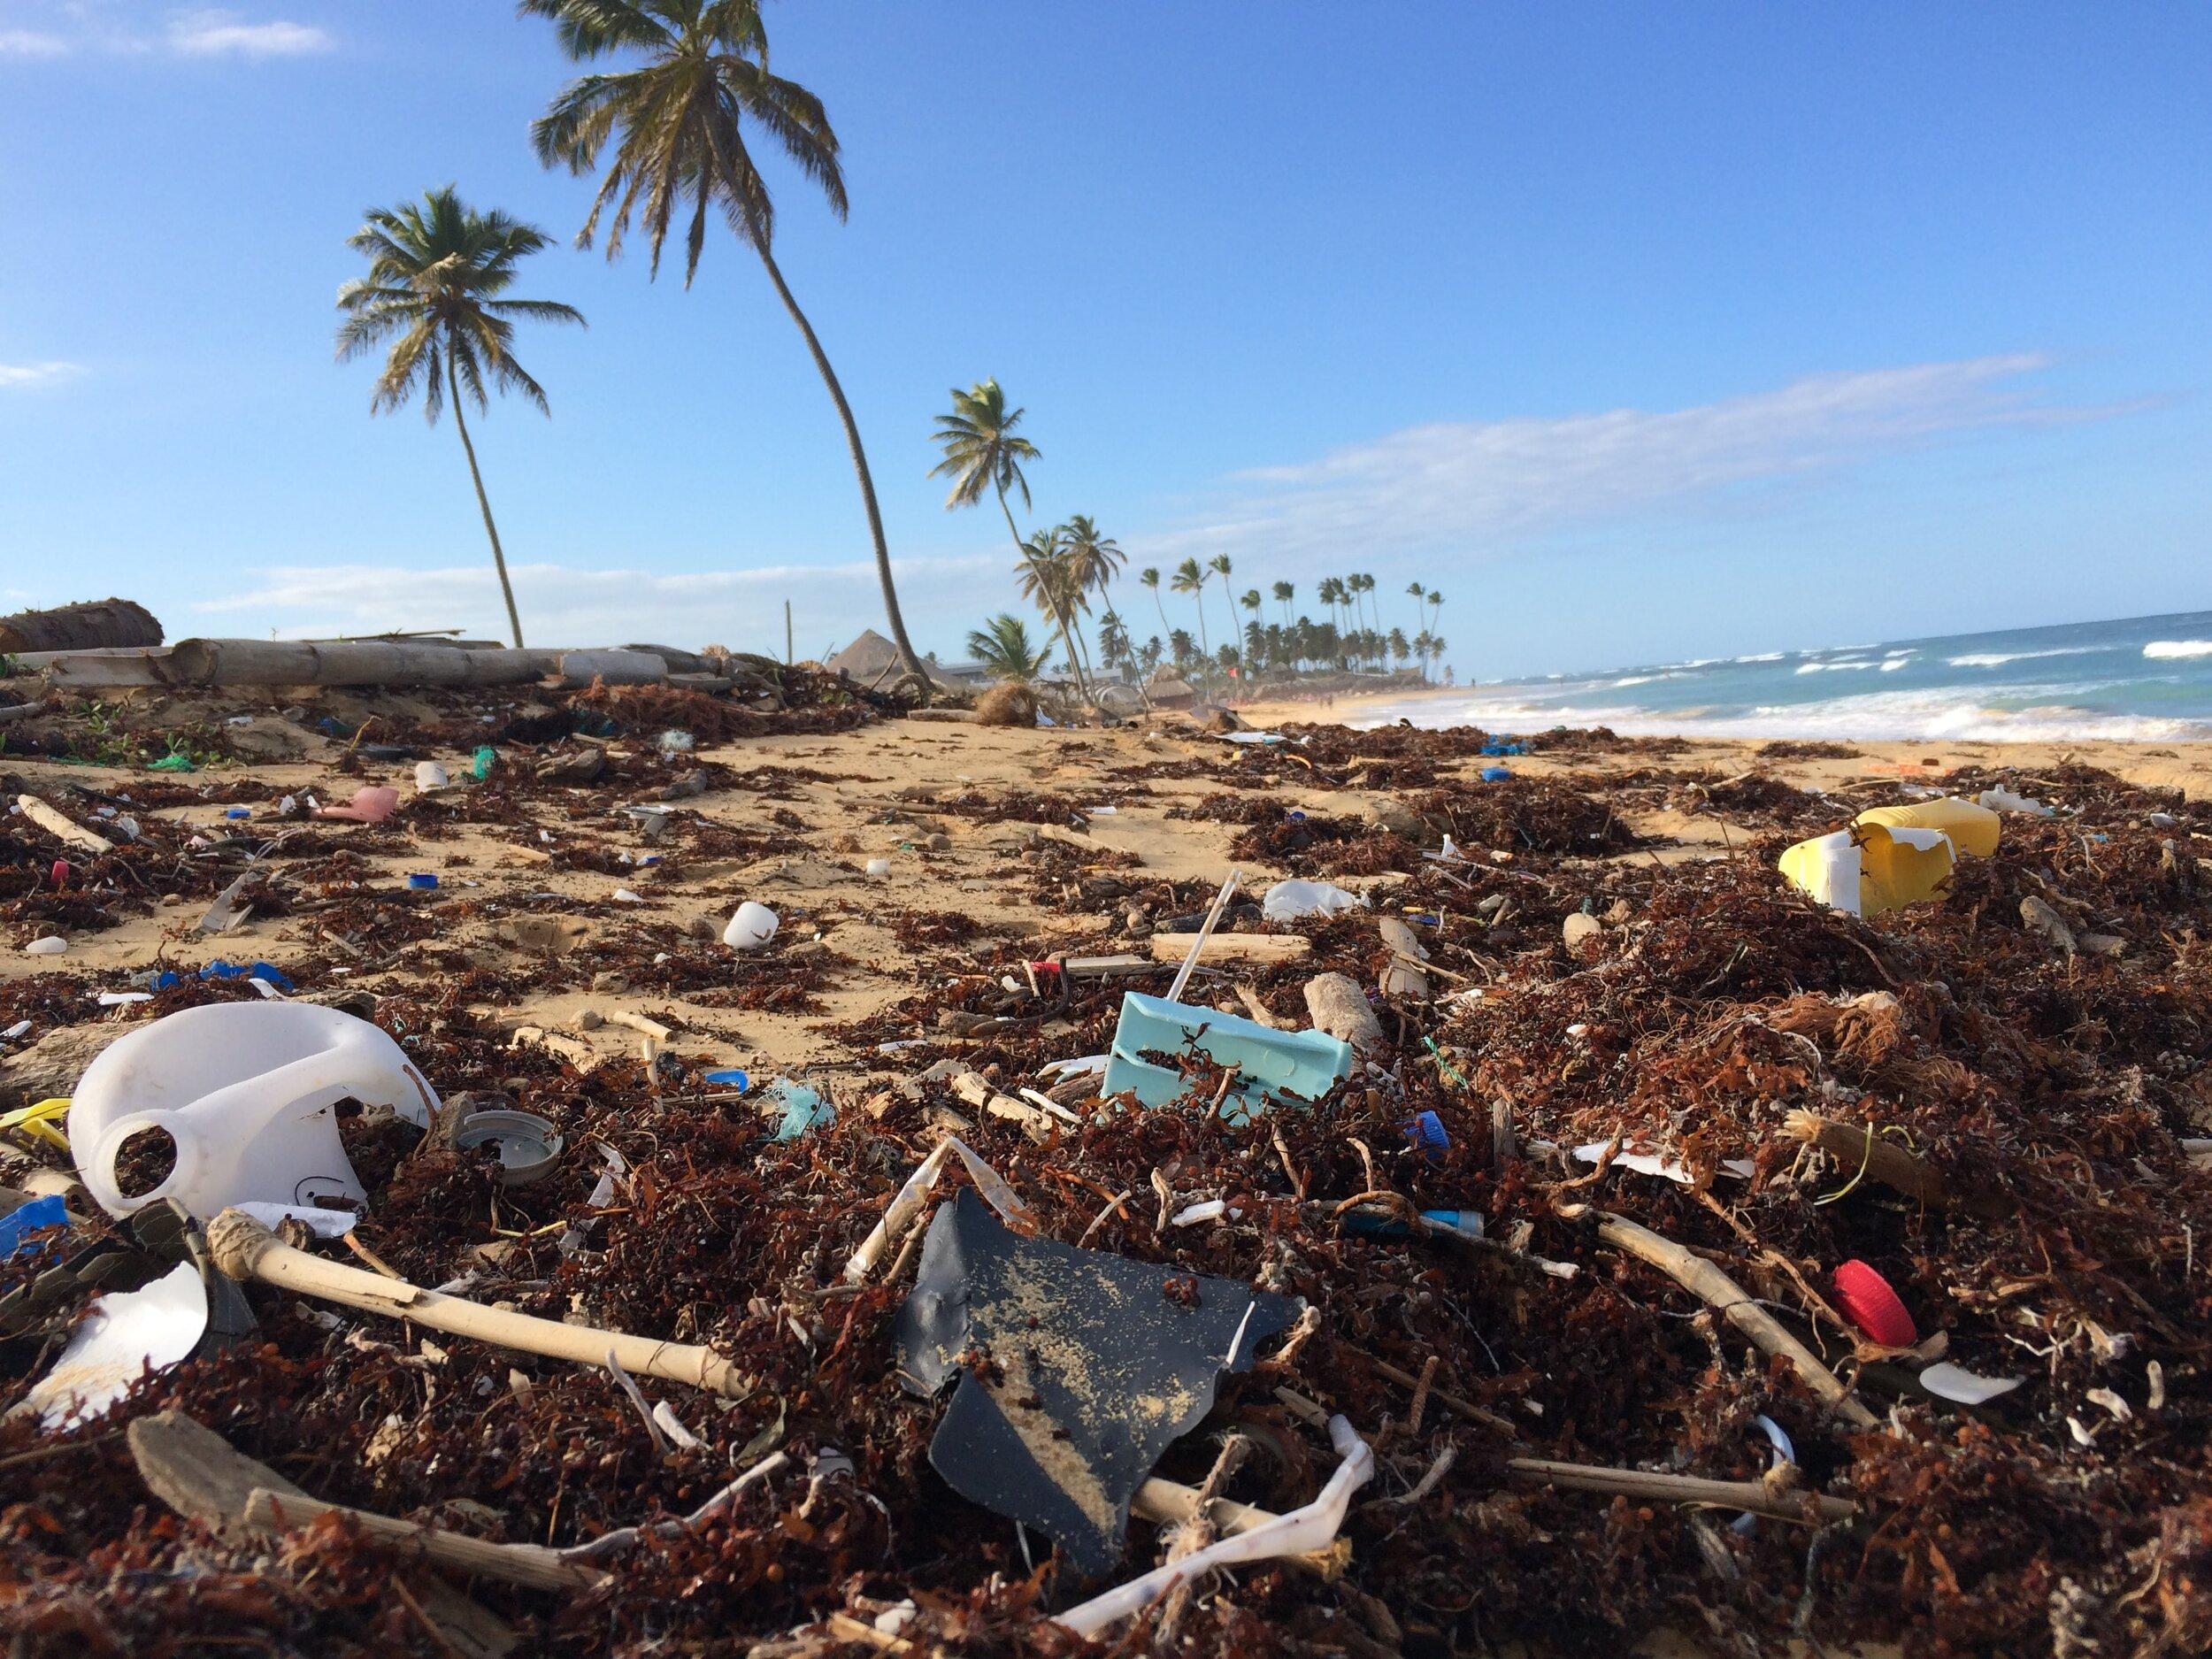 Rubbish on tropical island